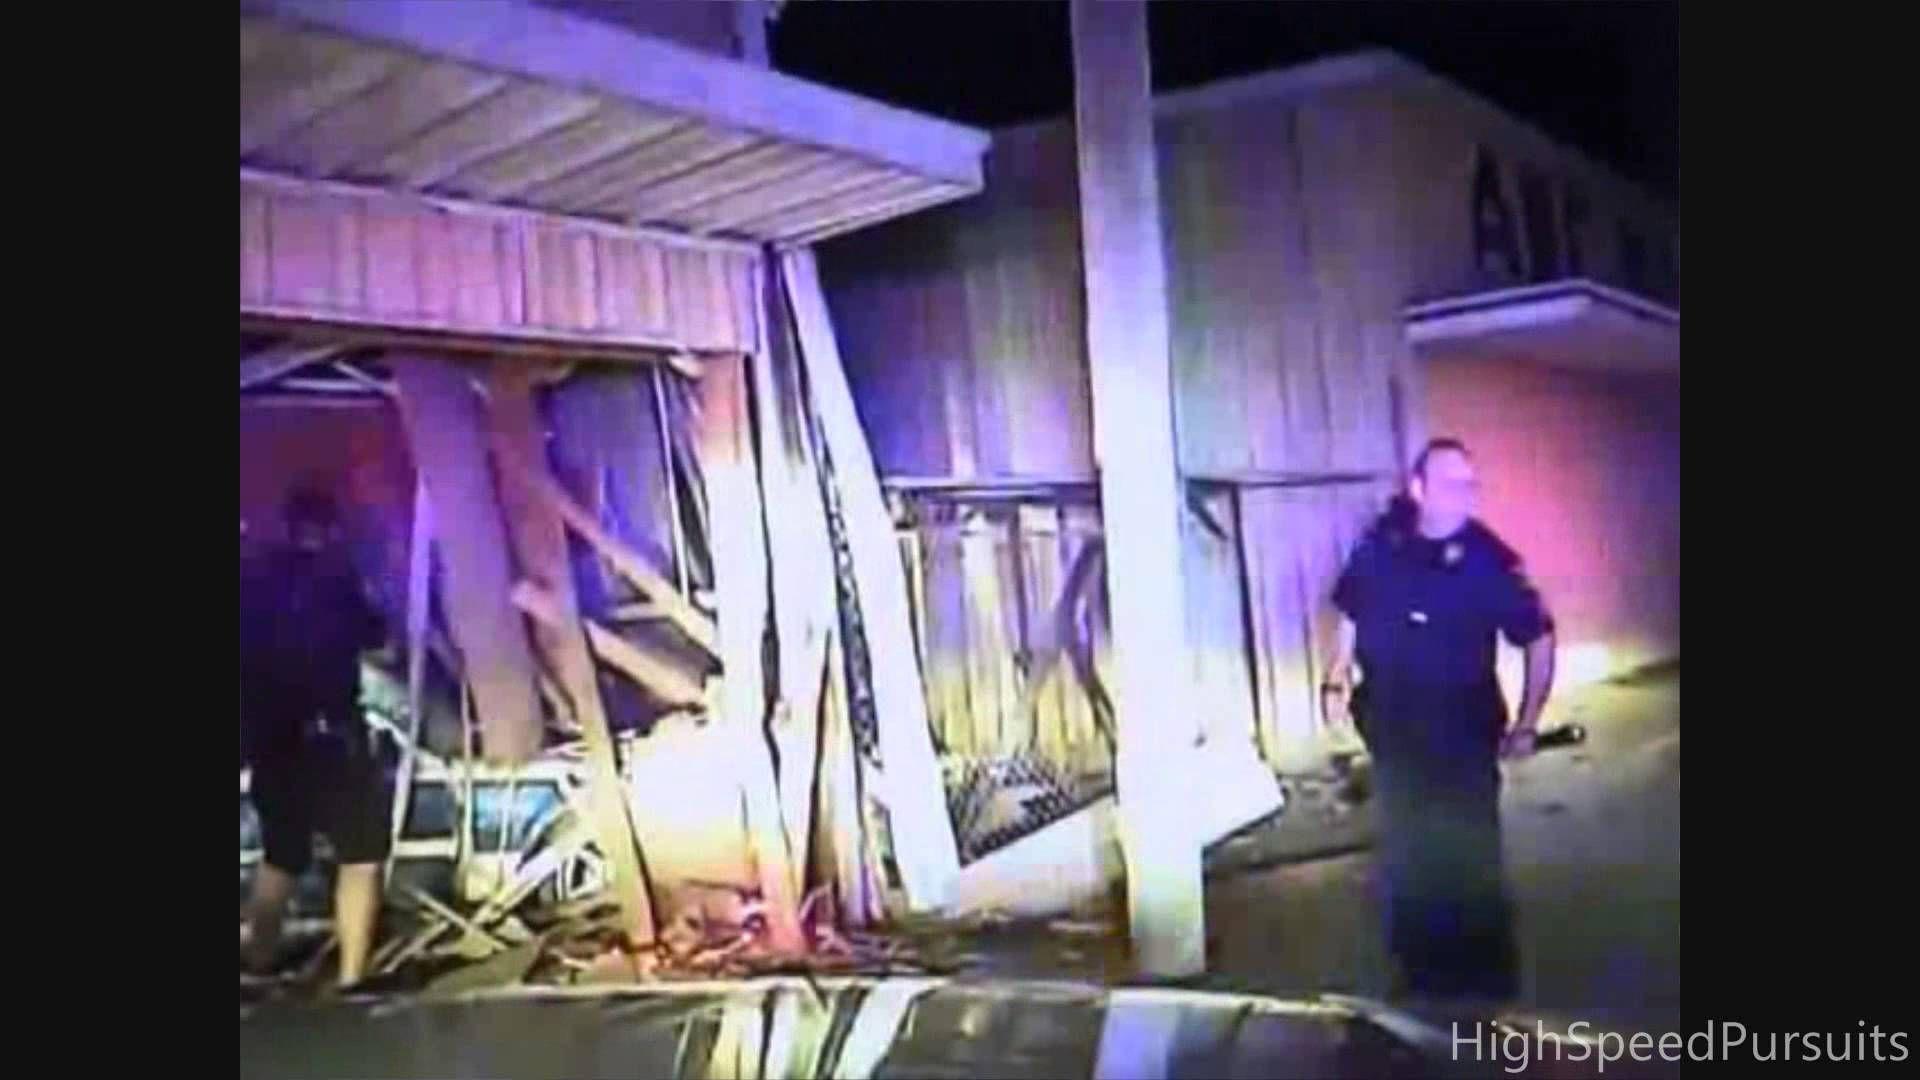 New Mexico High Speed Police Pursuit Fatal Crash (Dashcam